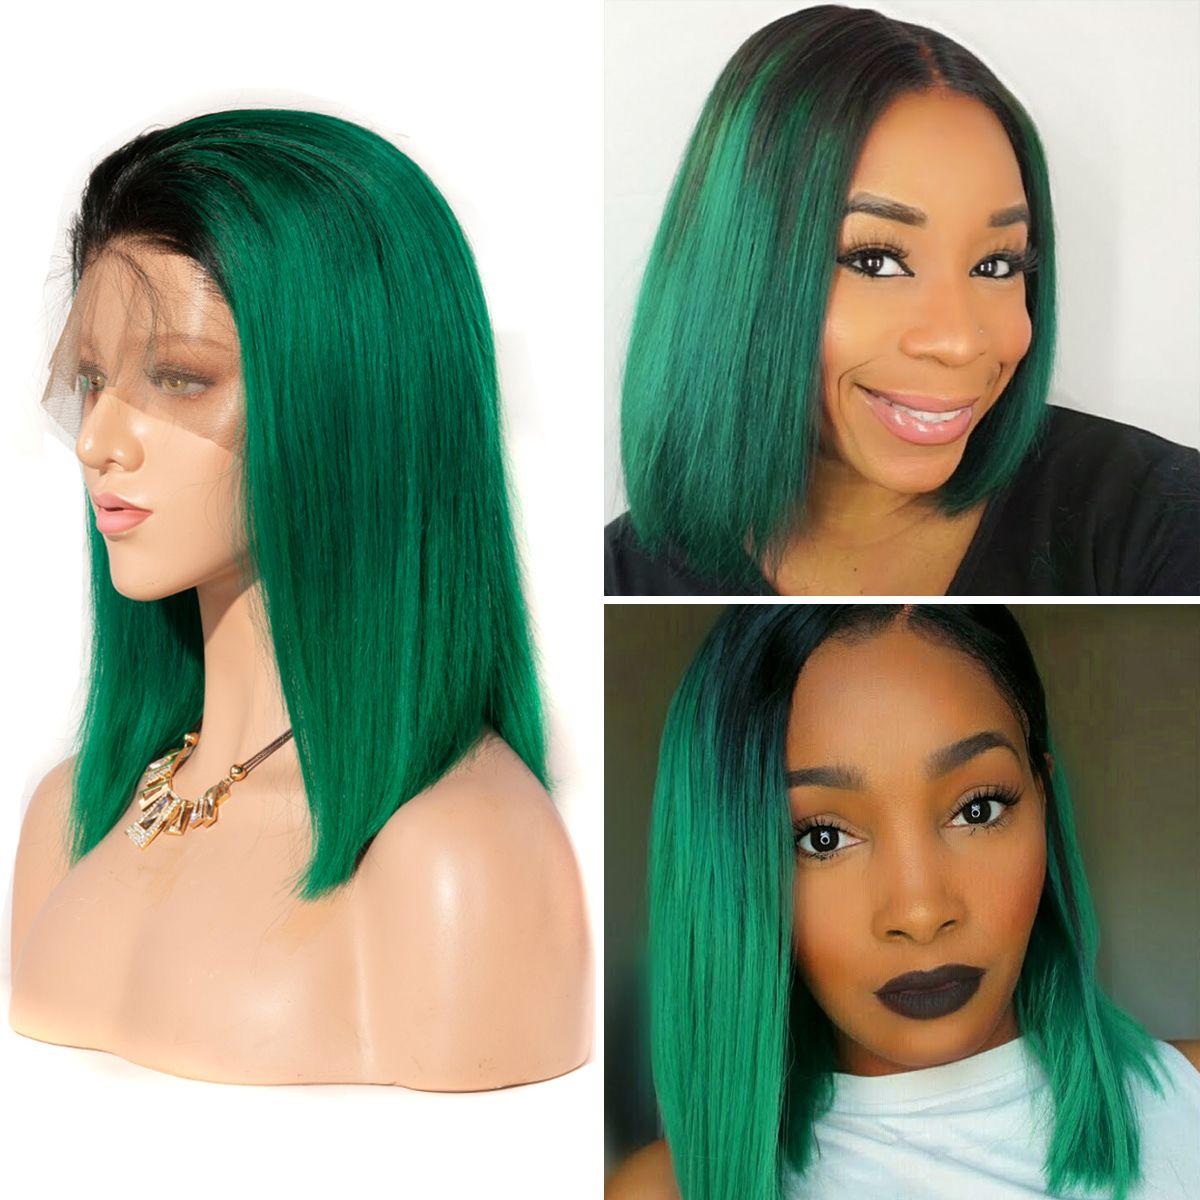 Colorful 13x6 Short Bob Straight Hair - 1B/Green